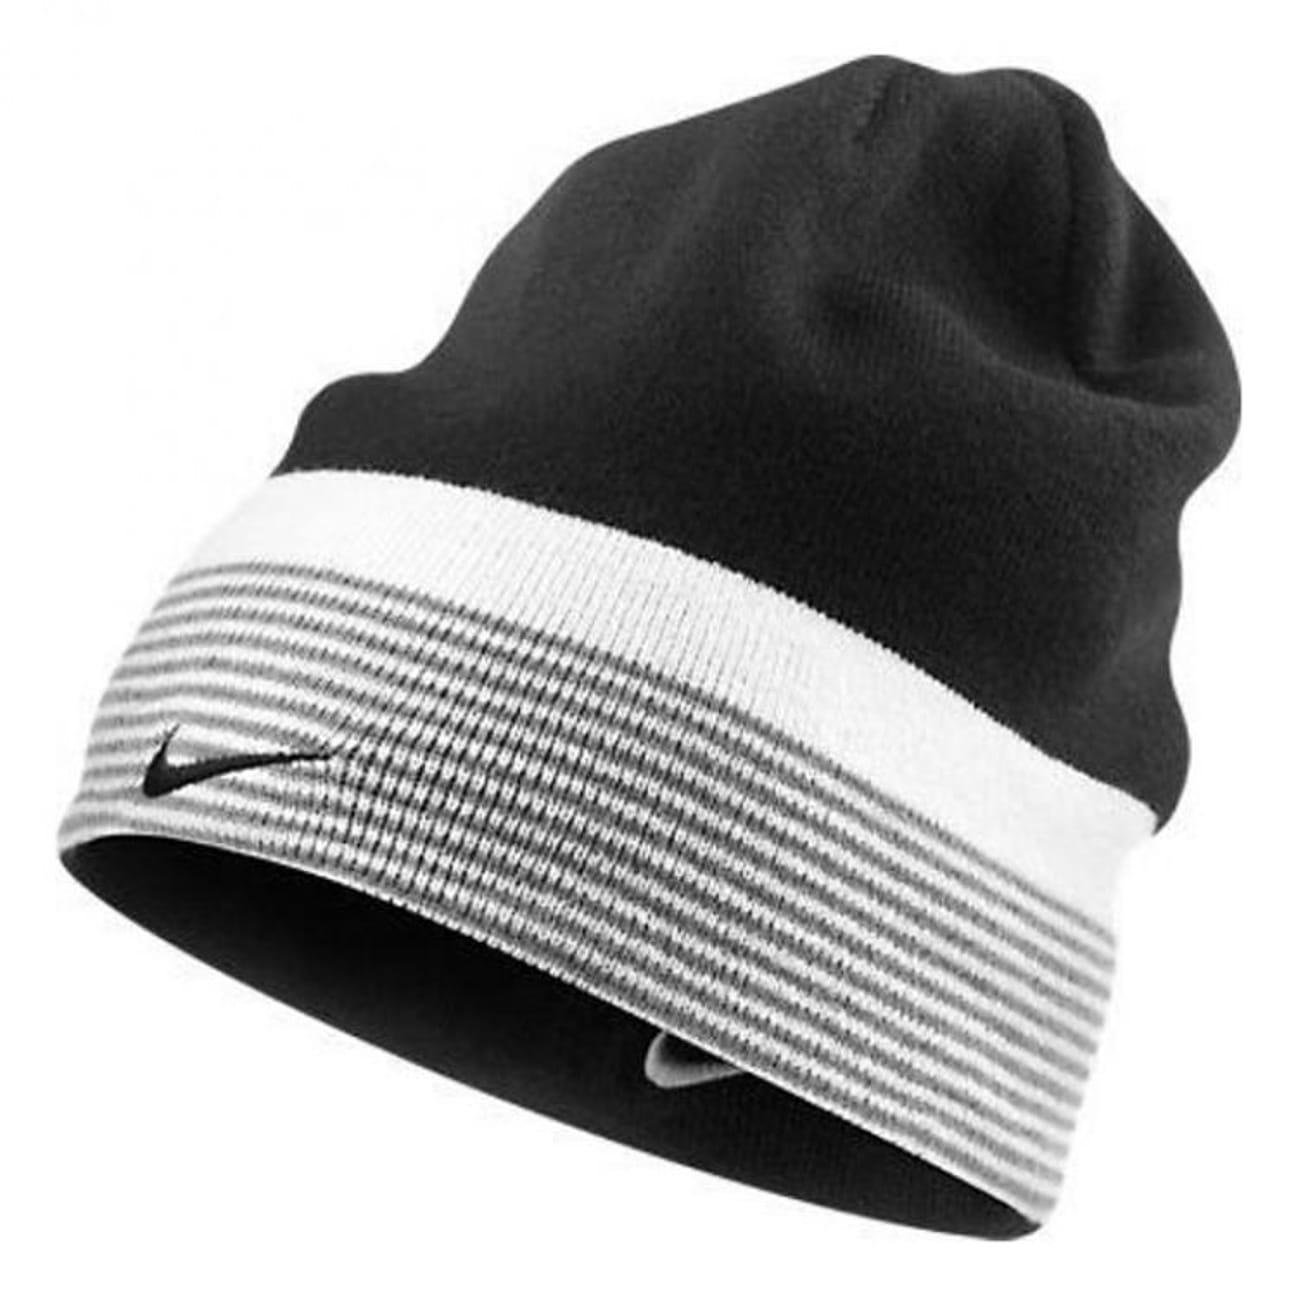 ... Stripe Reversible Beanie by Nike - black 1 ... 478fb7b7d8d